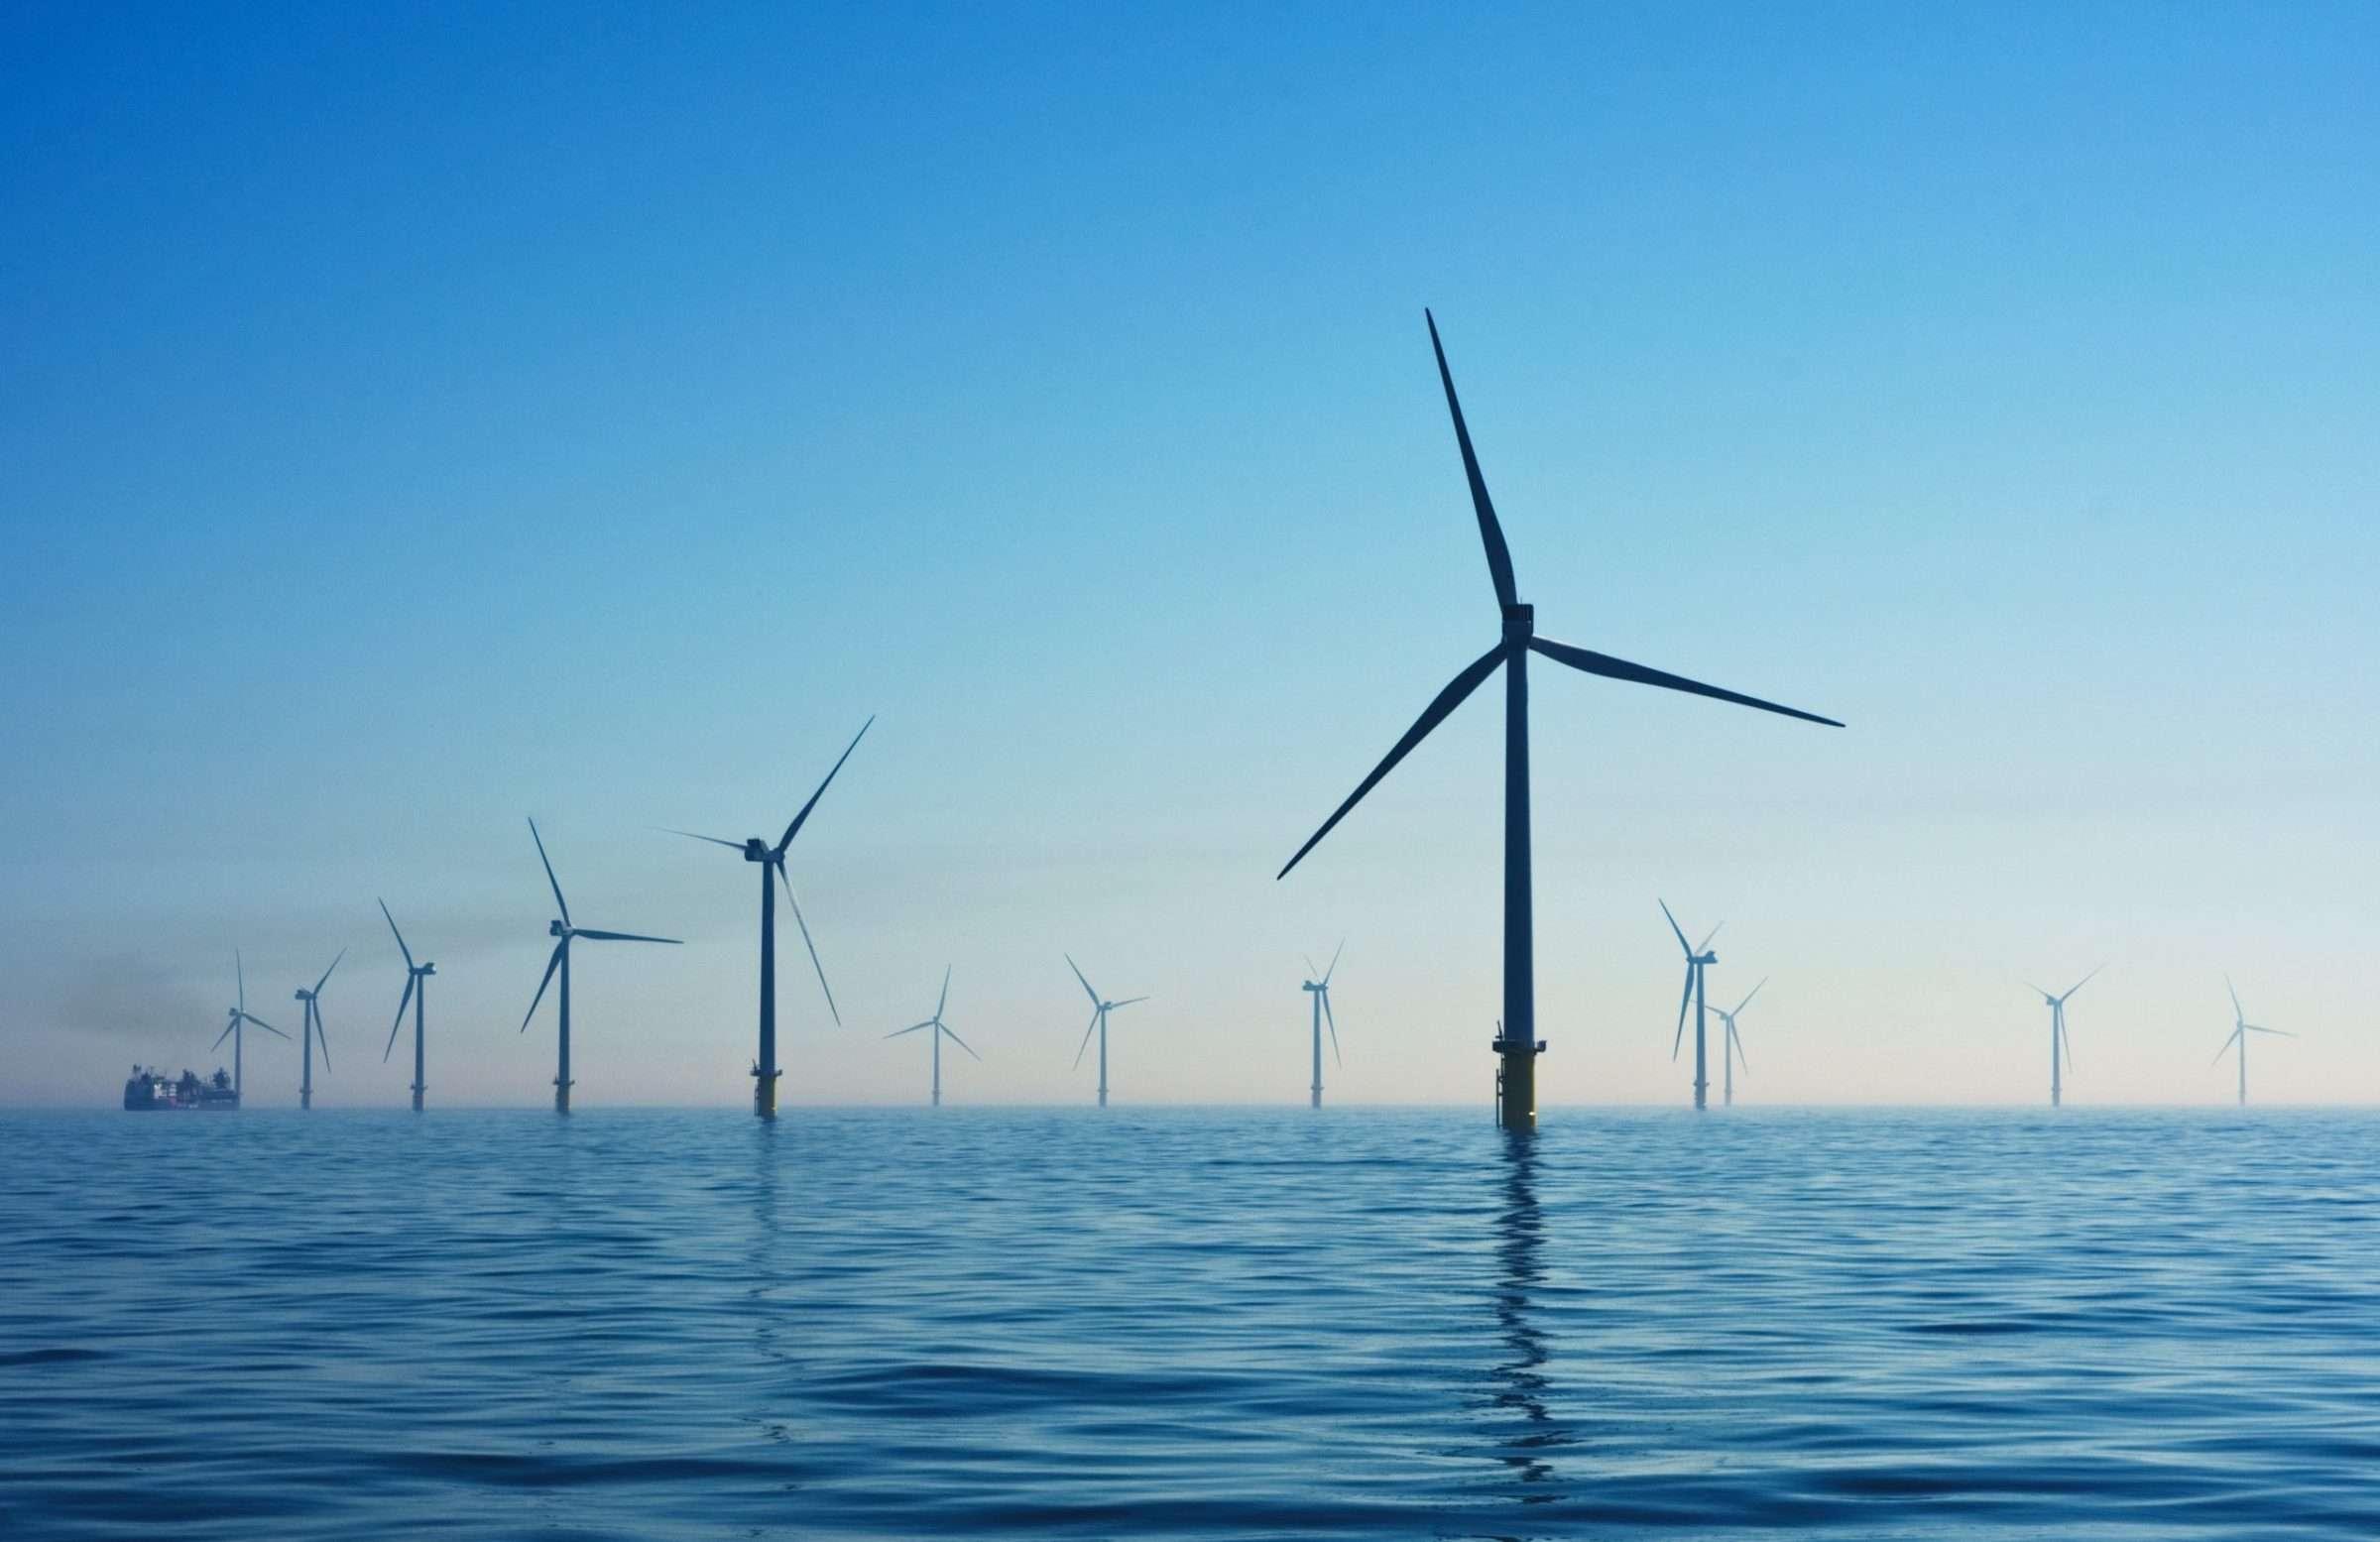 Photo of a wind farm